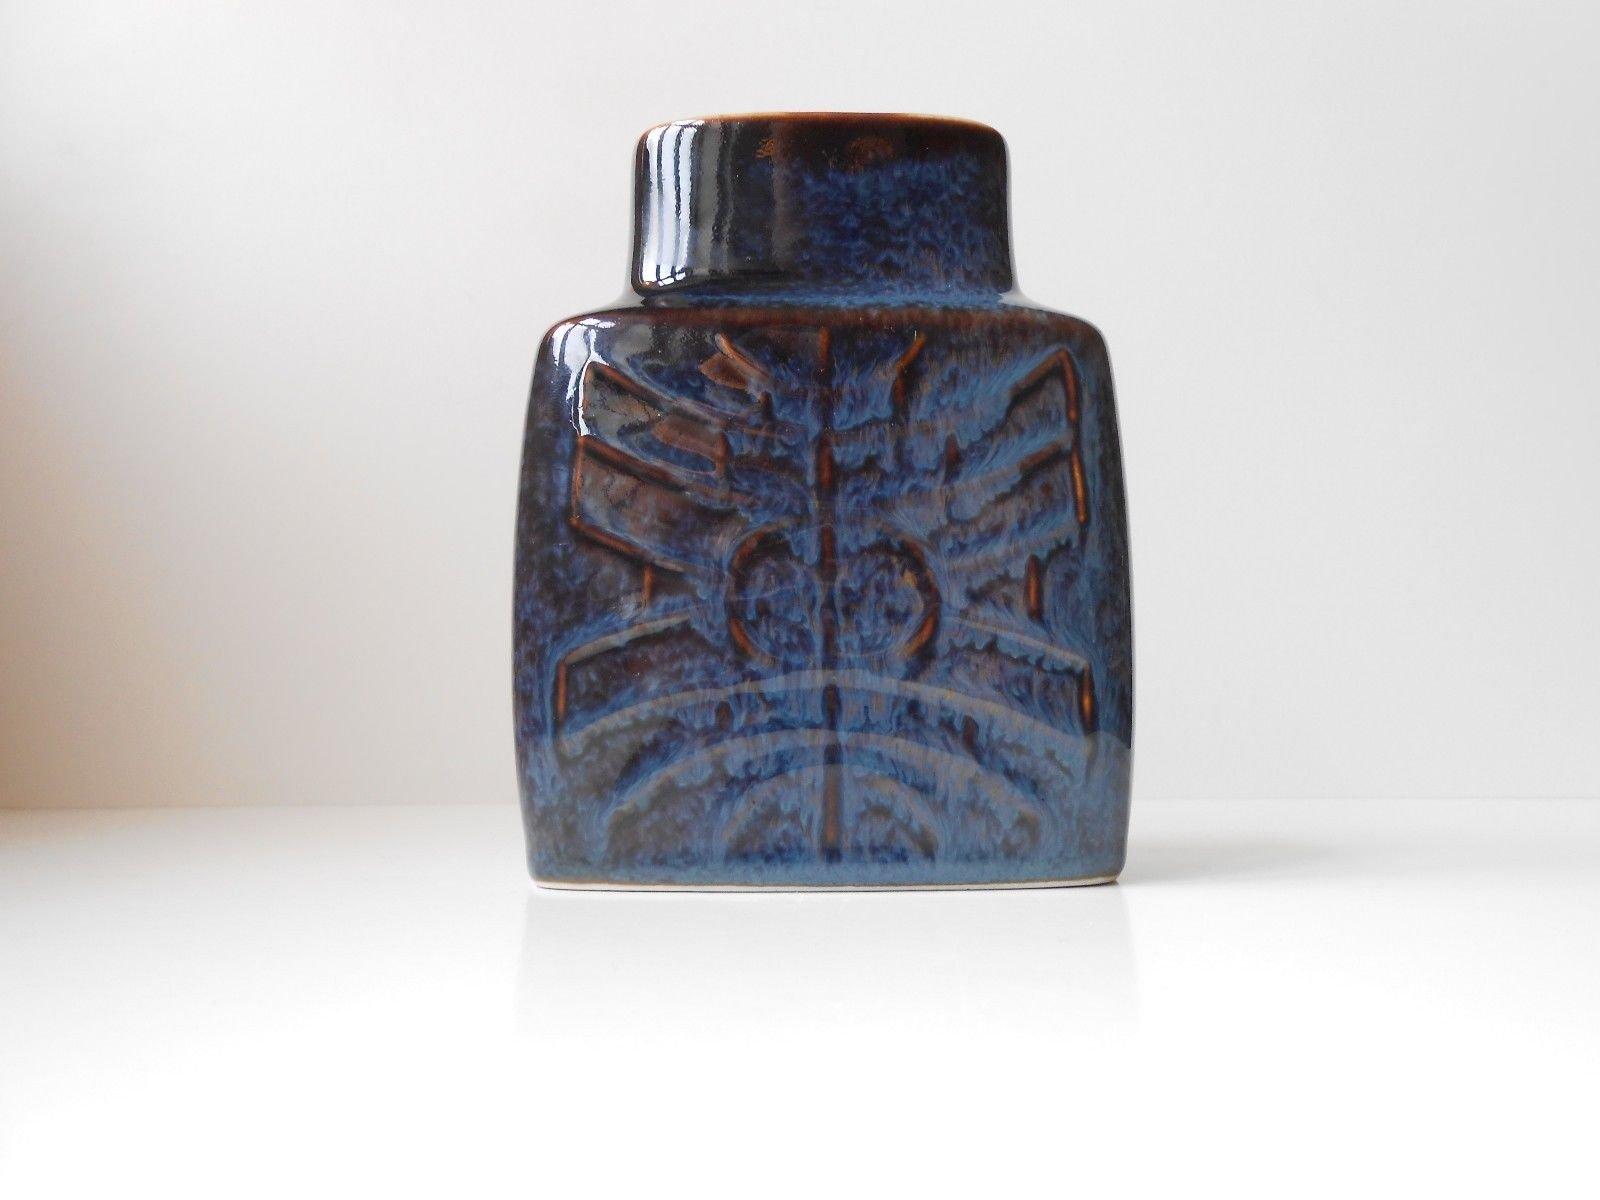 Glossy purple ceramic vase by carl harry stlhane for rrstrand glossy purple ceramic vase by carl harry stlhane for rrstrand 1960s reviewsmspy